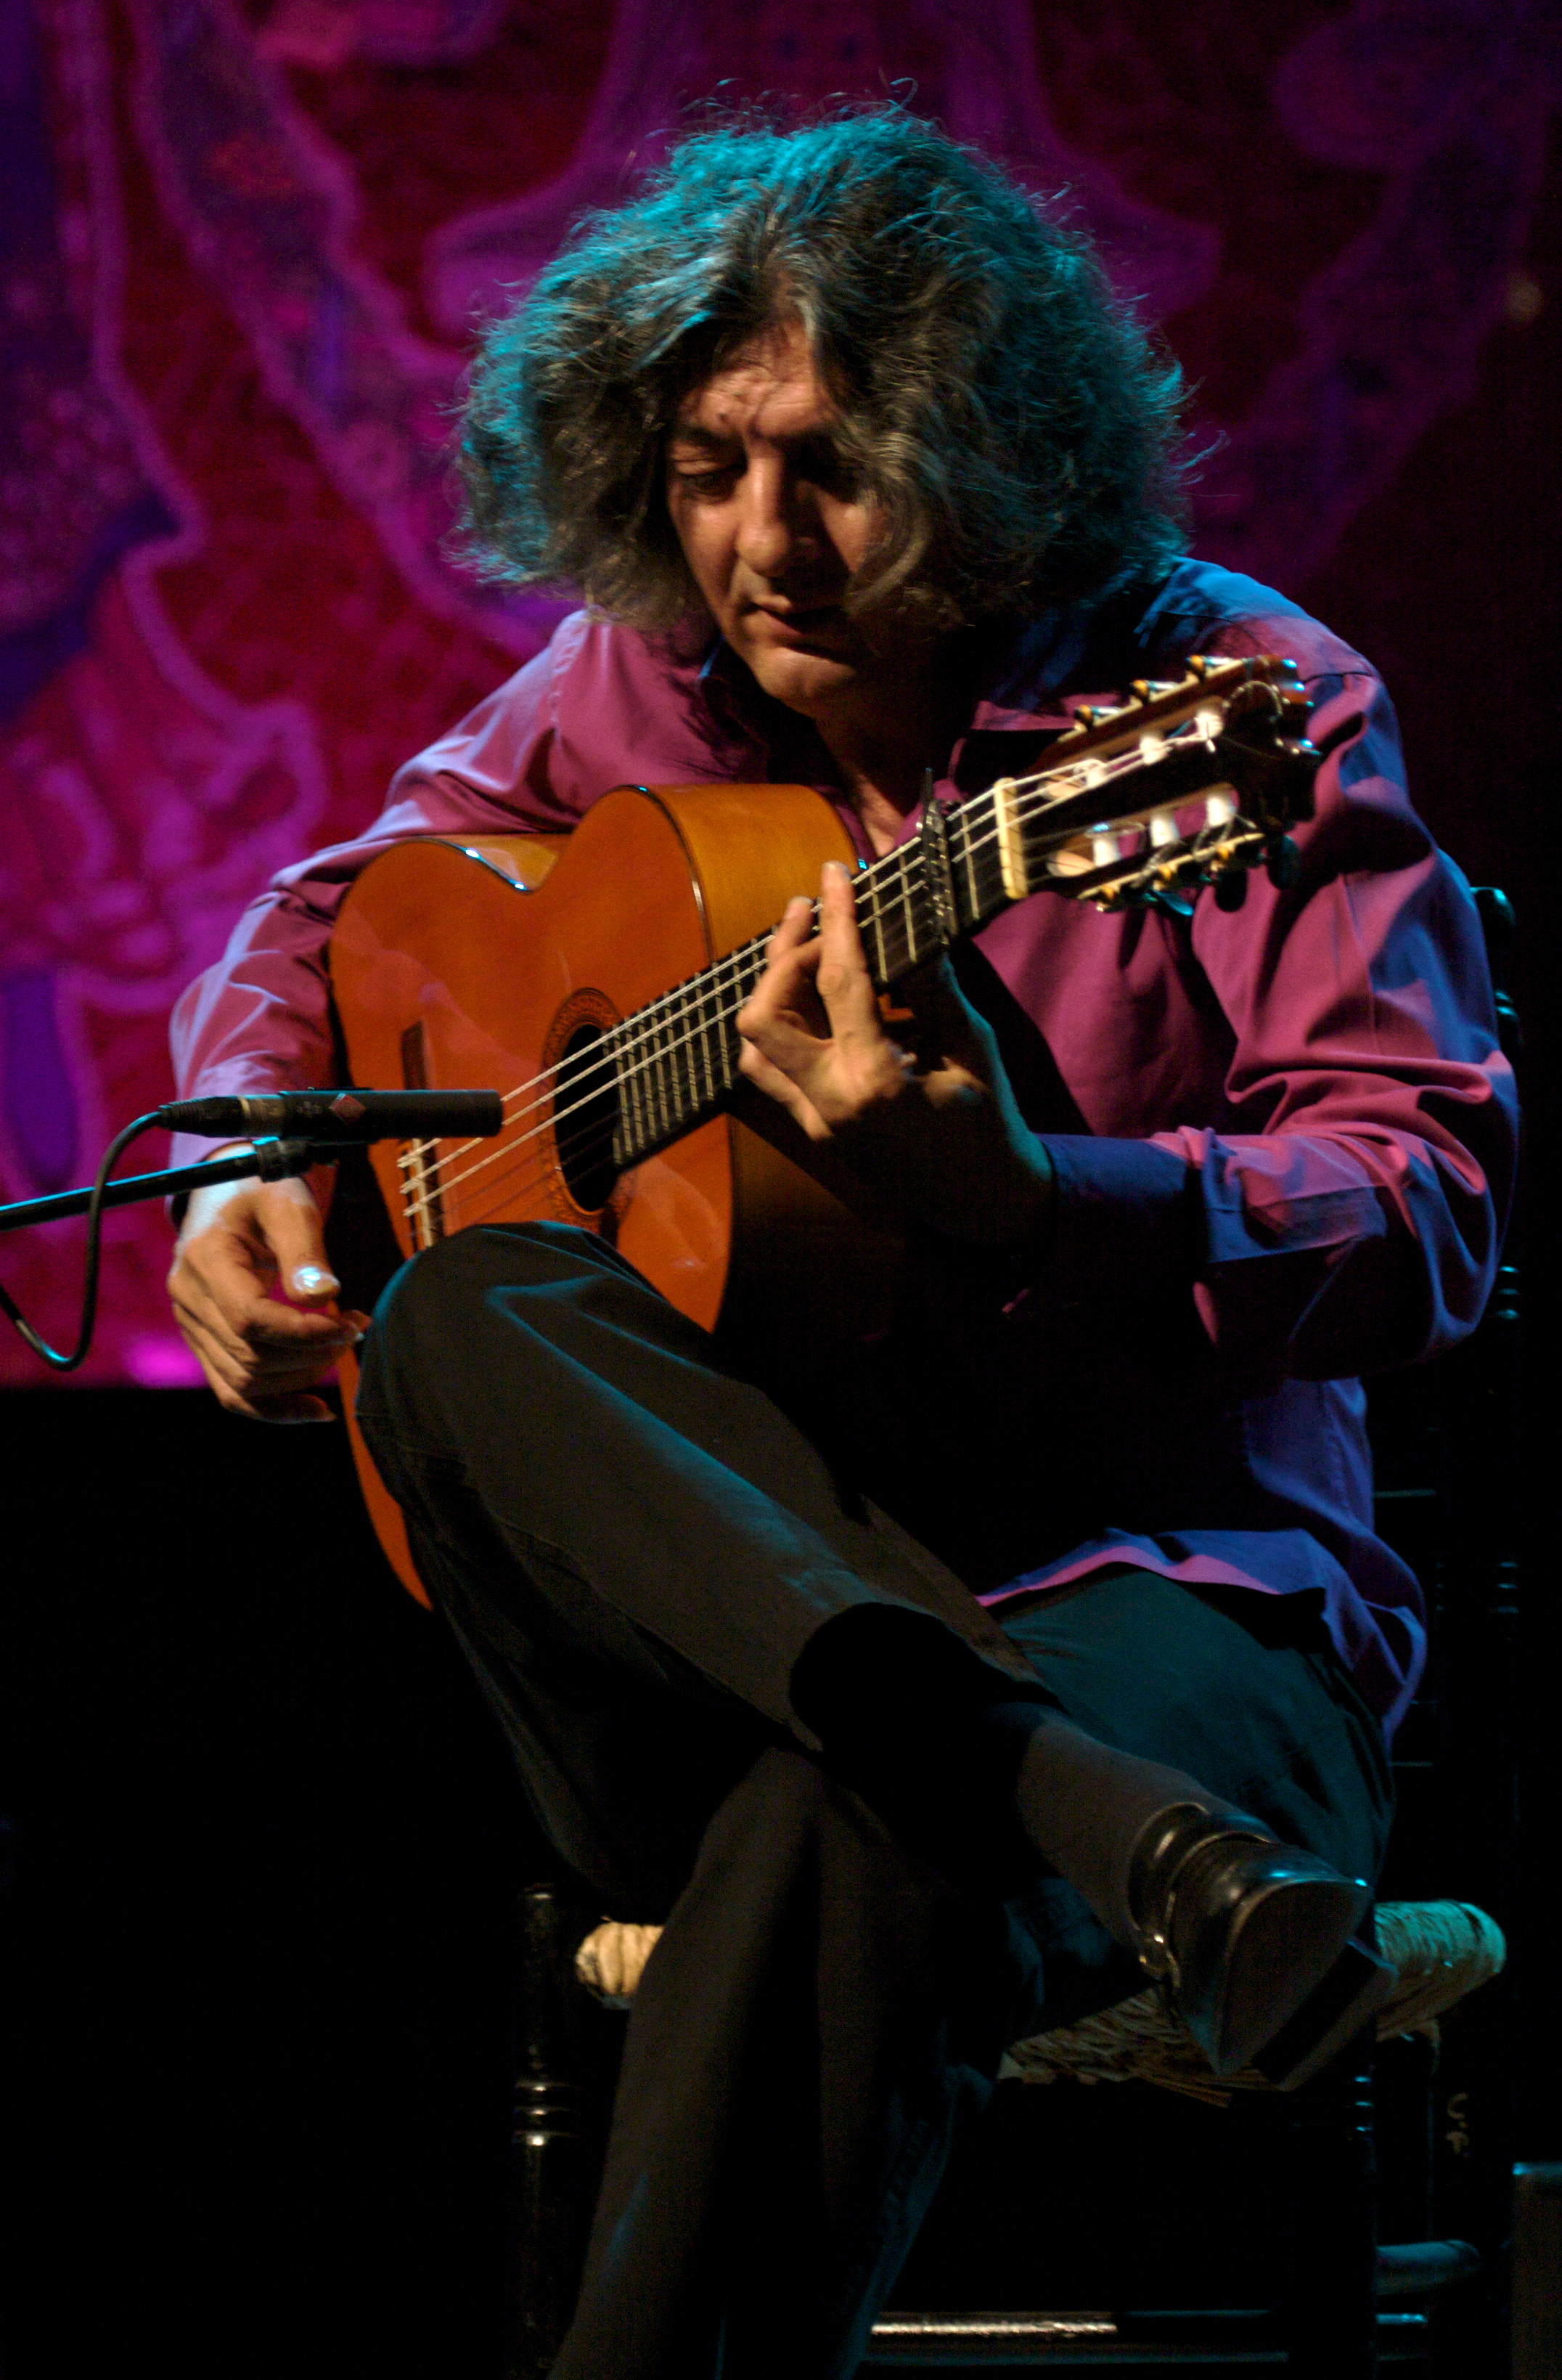 '''<small><div class='Enllasrelacio' style='border:0;margin-right:8px;'><br>Moraíto Chico (Manuel Moreno Junquera: Jerez de la Frontera, 13 de septiembre de 1956 - ibíd., 10 de agosto del 2011) fue un guitarrista flamenco gitano español.</div><br>  <div class='Enllasrelacio' style='color:#666666;font-size:9px;'>Leer más</div>  <div style='clear:both;margin-top:12px;float:left;'>&nbsp;</div></div><div class='Blocsumari'><div class='Titolrelacio'>Artículos relacionados</div>  <div class='Enllasrelacio' onmouseover='color_over(this)' onmouseout='color_out(this,0)'><a href='co/2899/2/fallece-en-jerez-de-la-frontera-el-guitarrista-moraito-chico'>Fallece en Jerez de la Frontera el guitarrista «Moraíto Chico» <span style='color:#777777'>[11/08/2011]</span>  </a></div></div>  </div><div class='marccanconer'><div id='canconer' class='canconer'><div style='font-family: Calibri, Verdana, Arial, Helvetica, sans-serif;font-size: 22px;font-weight: bold;color: #000030;letter-spacing: -1px; text-align: left;border-top: 2px solid #999999;border-bottom: 1px solid #cccccc;'>Miguel Poveda</div><a href='nc/11094/0/y-yo-que-culpa-tengo-rafael-fernandez-suarez-manuel-moreno-junquera'><big>Y yo qué culpa tengo</big></a>  <em>(<a href='aa/2133/0/canciones-de-rafael-fernandez-suarez'>Rafael Fernández Suárez</a> - <a href='aa/2118/0/canciones-de-manuel-moreno-junquera'>Manuel Moreno Junquera</a>)</em><br>  </div></div></div>          <script language=